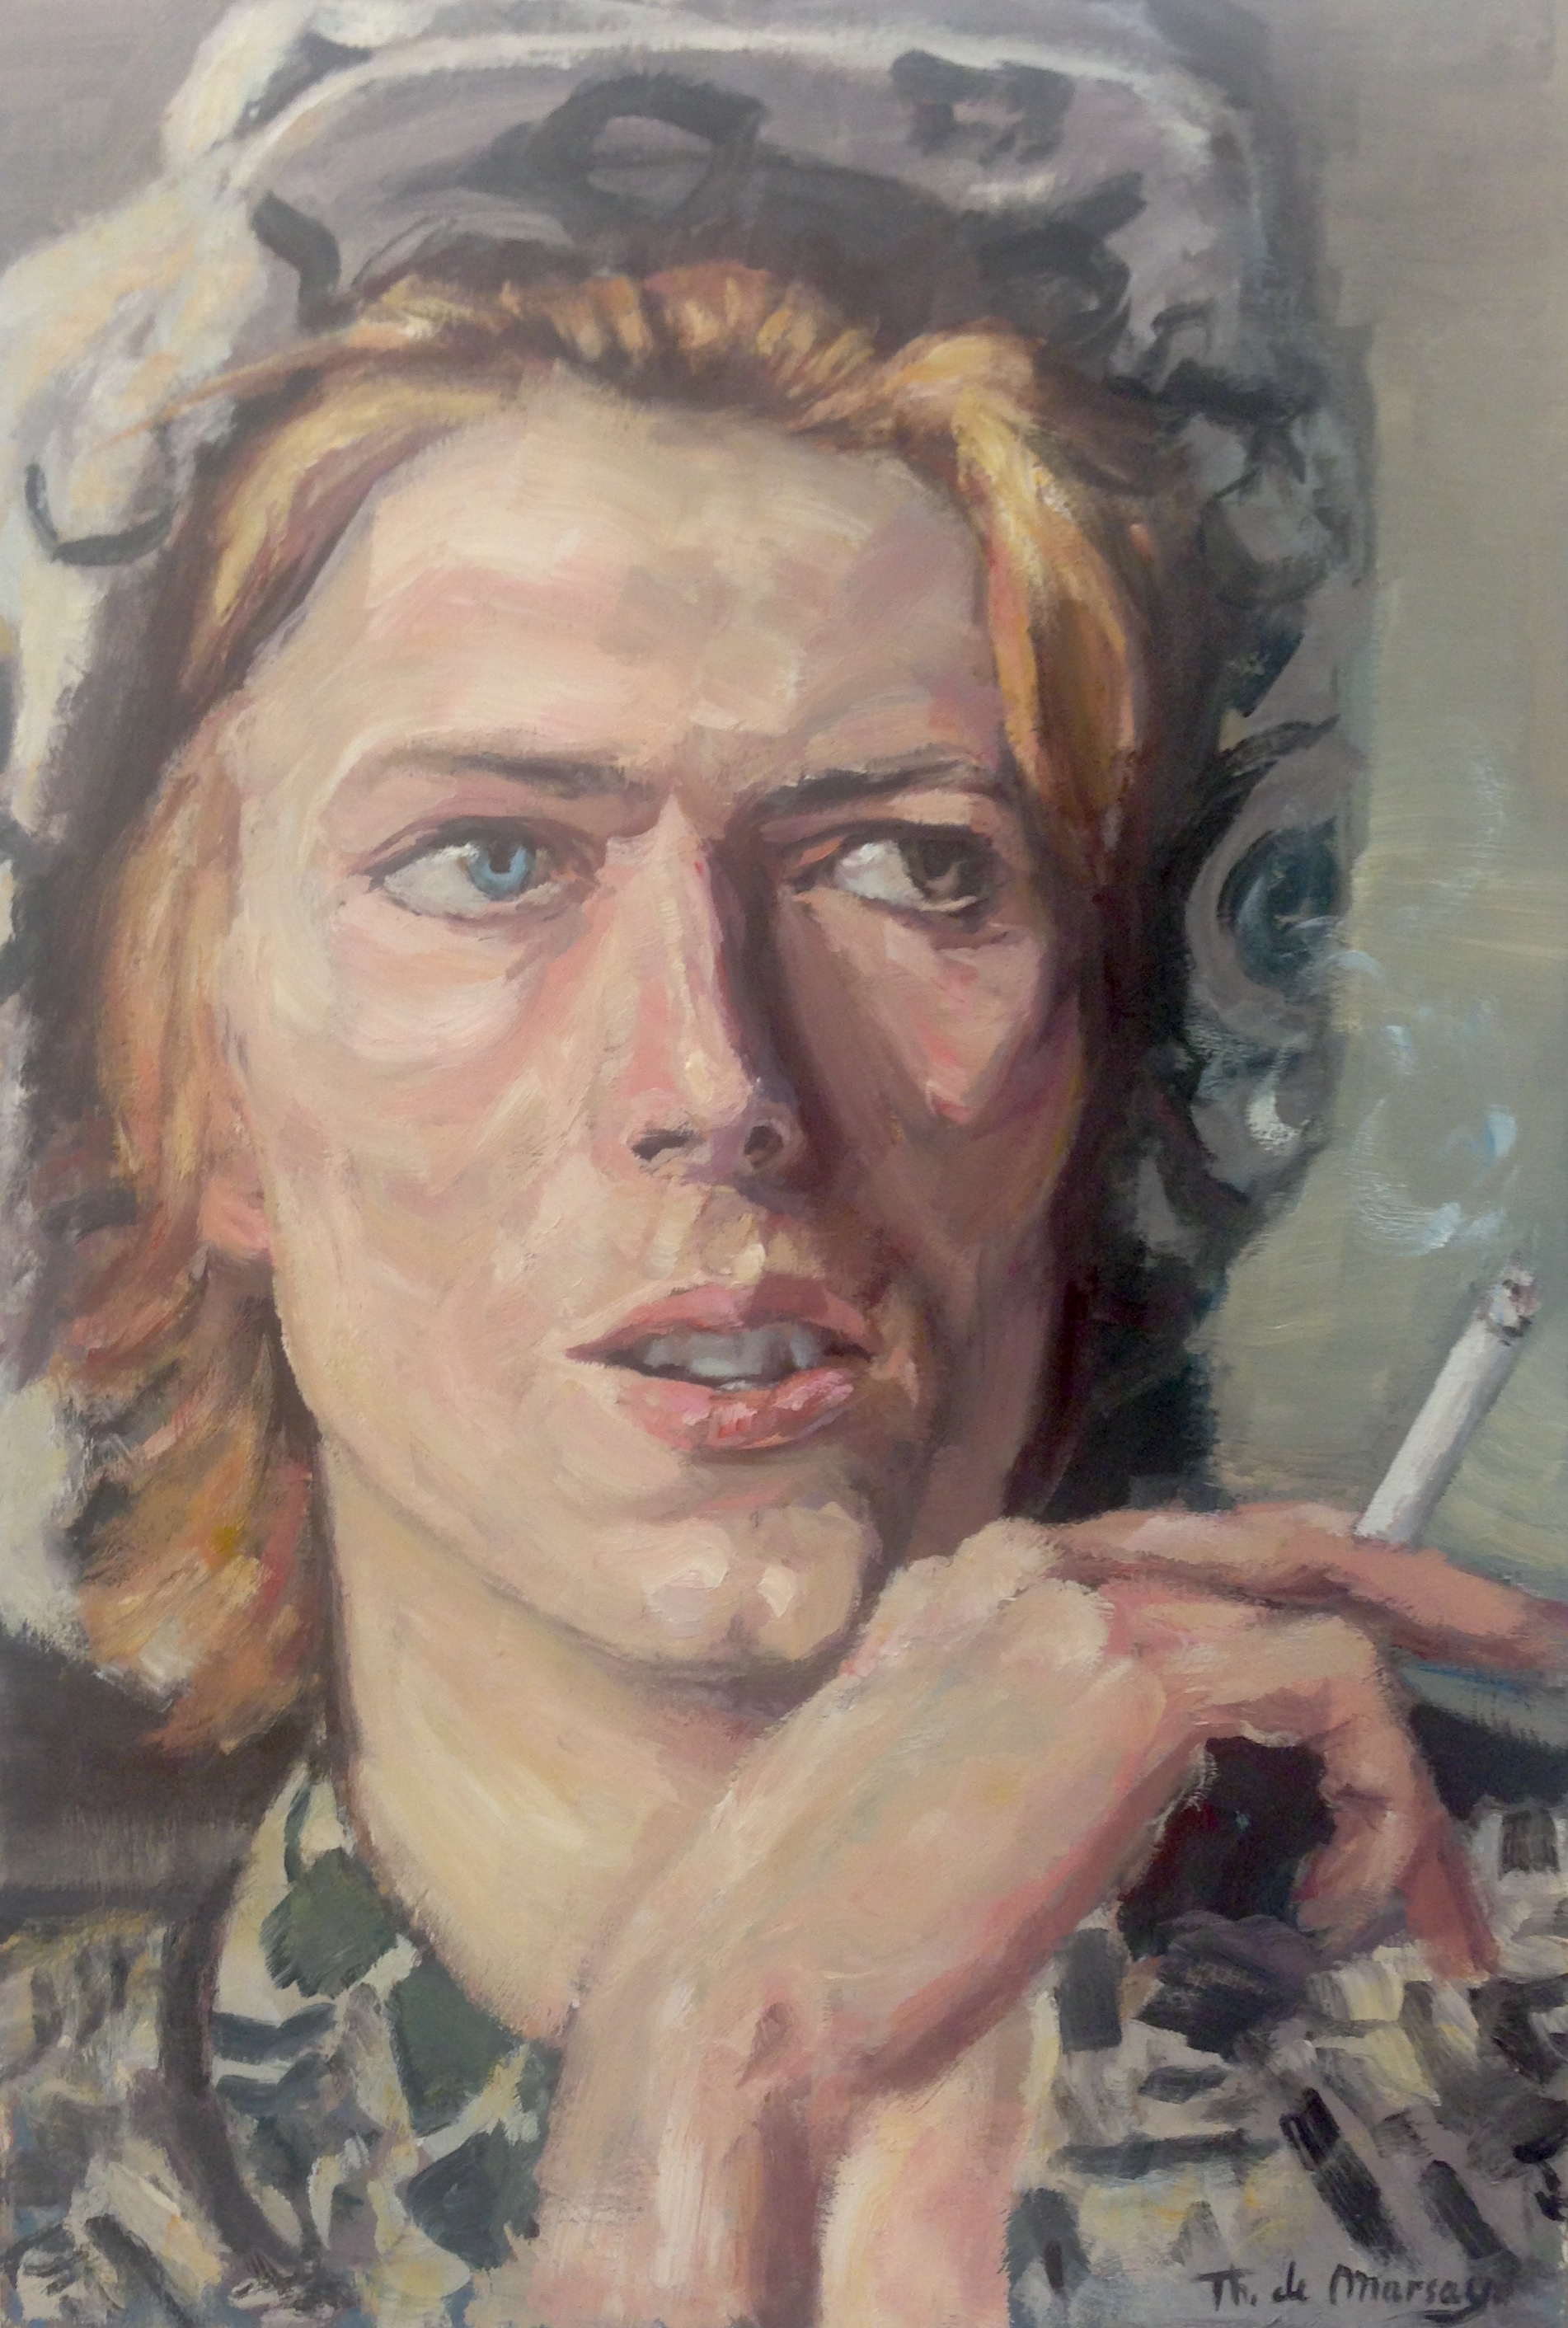 Bowie smoking 2.